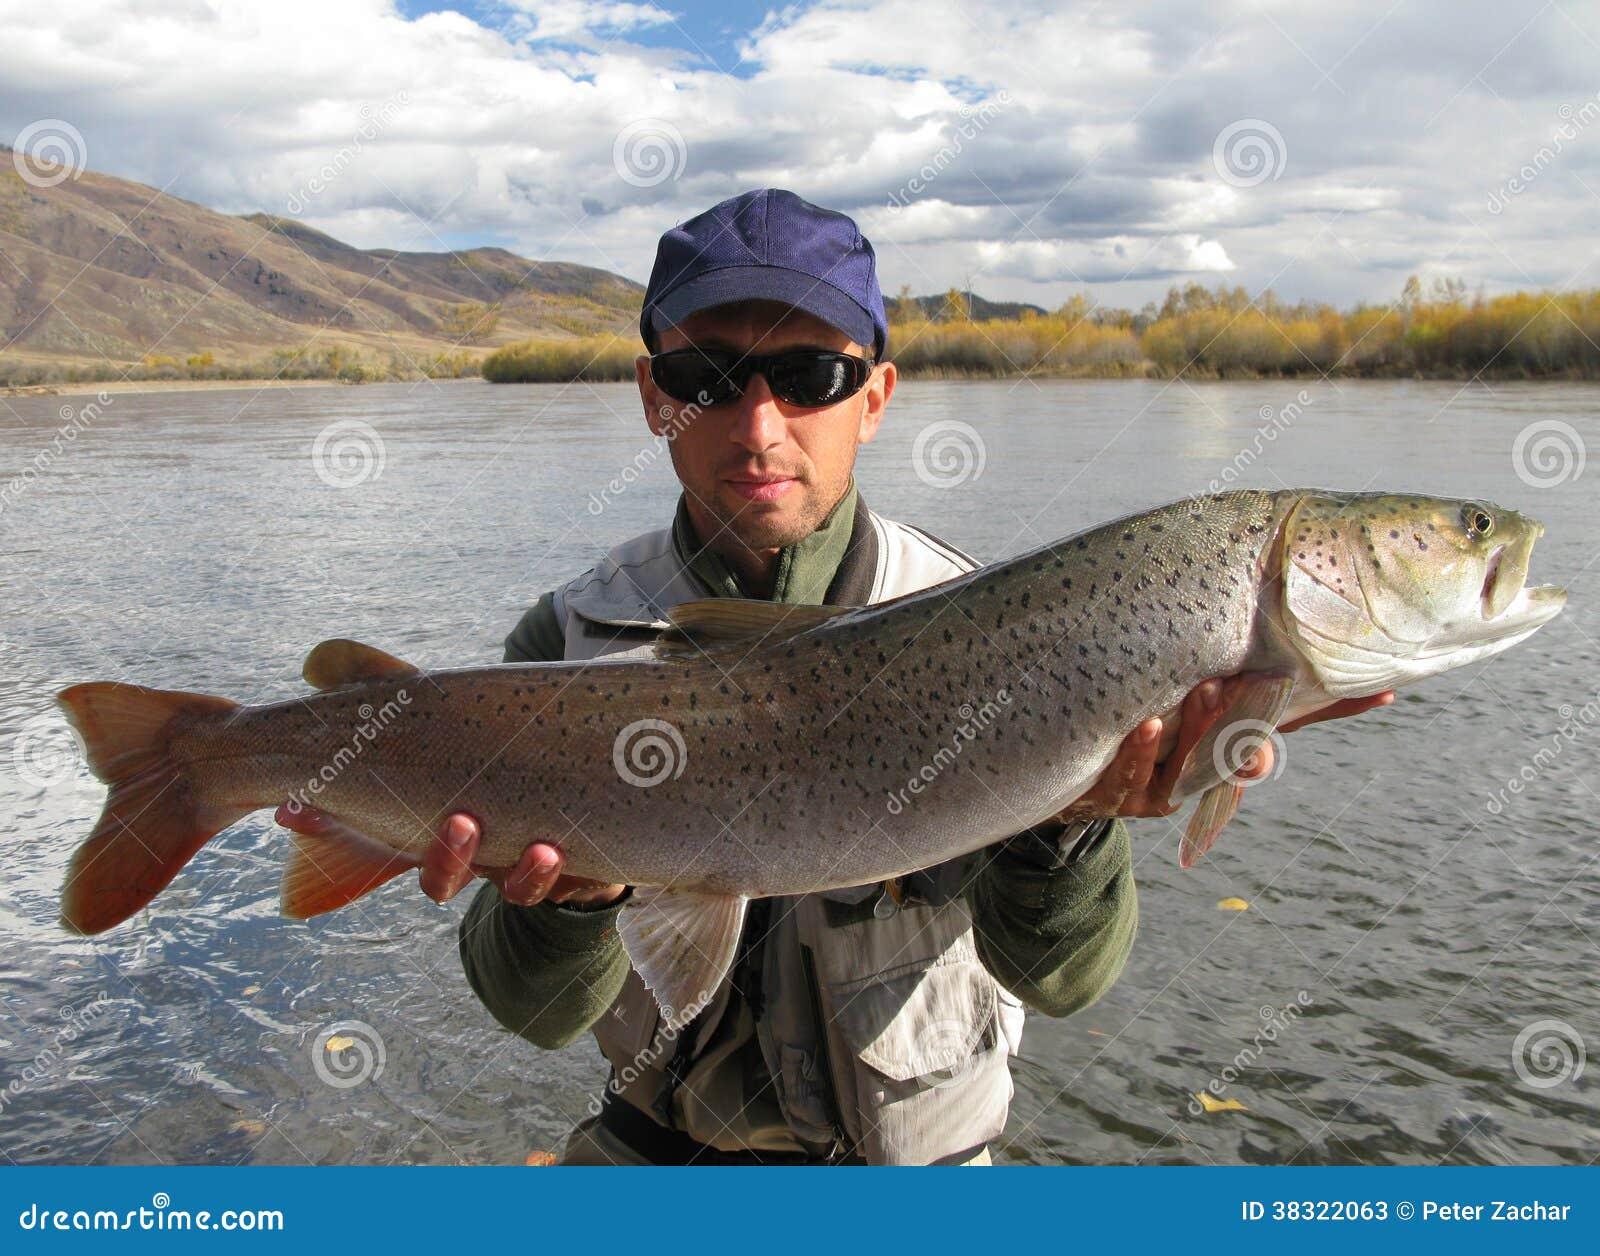 Taimen fishing mongolia stock photos image 38322063 for Taimen fishing mongolia